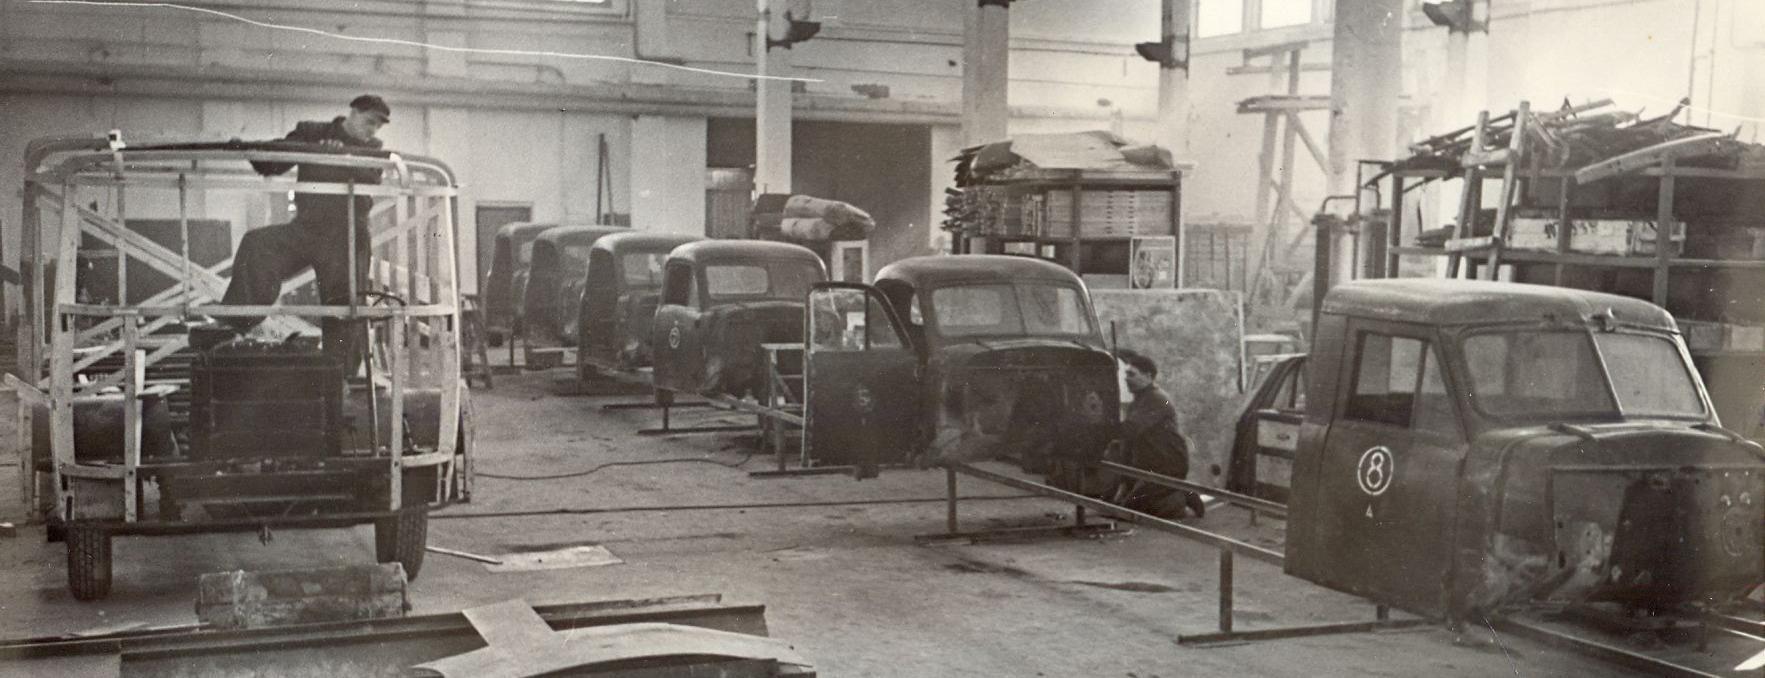 Furgoonautode tootmine Tartus (002)